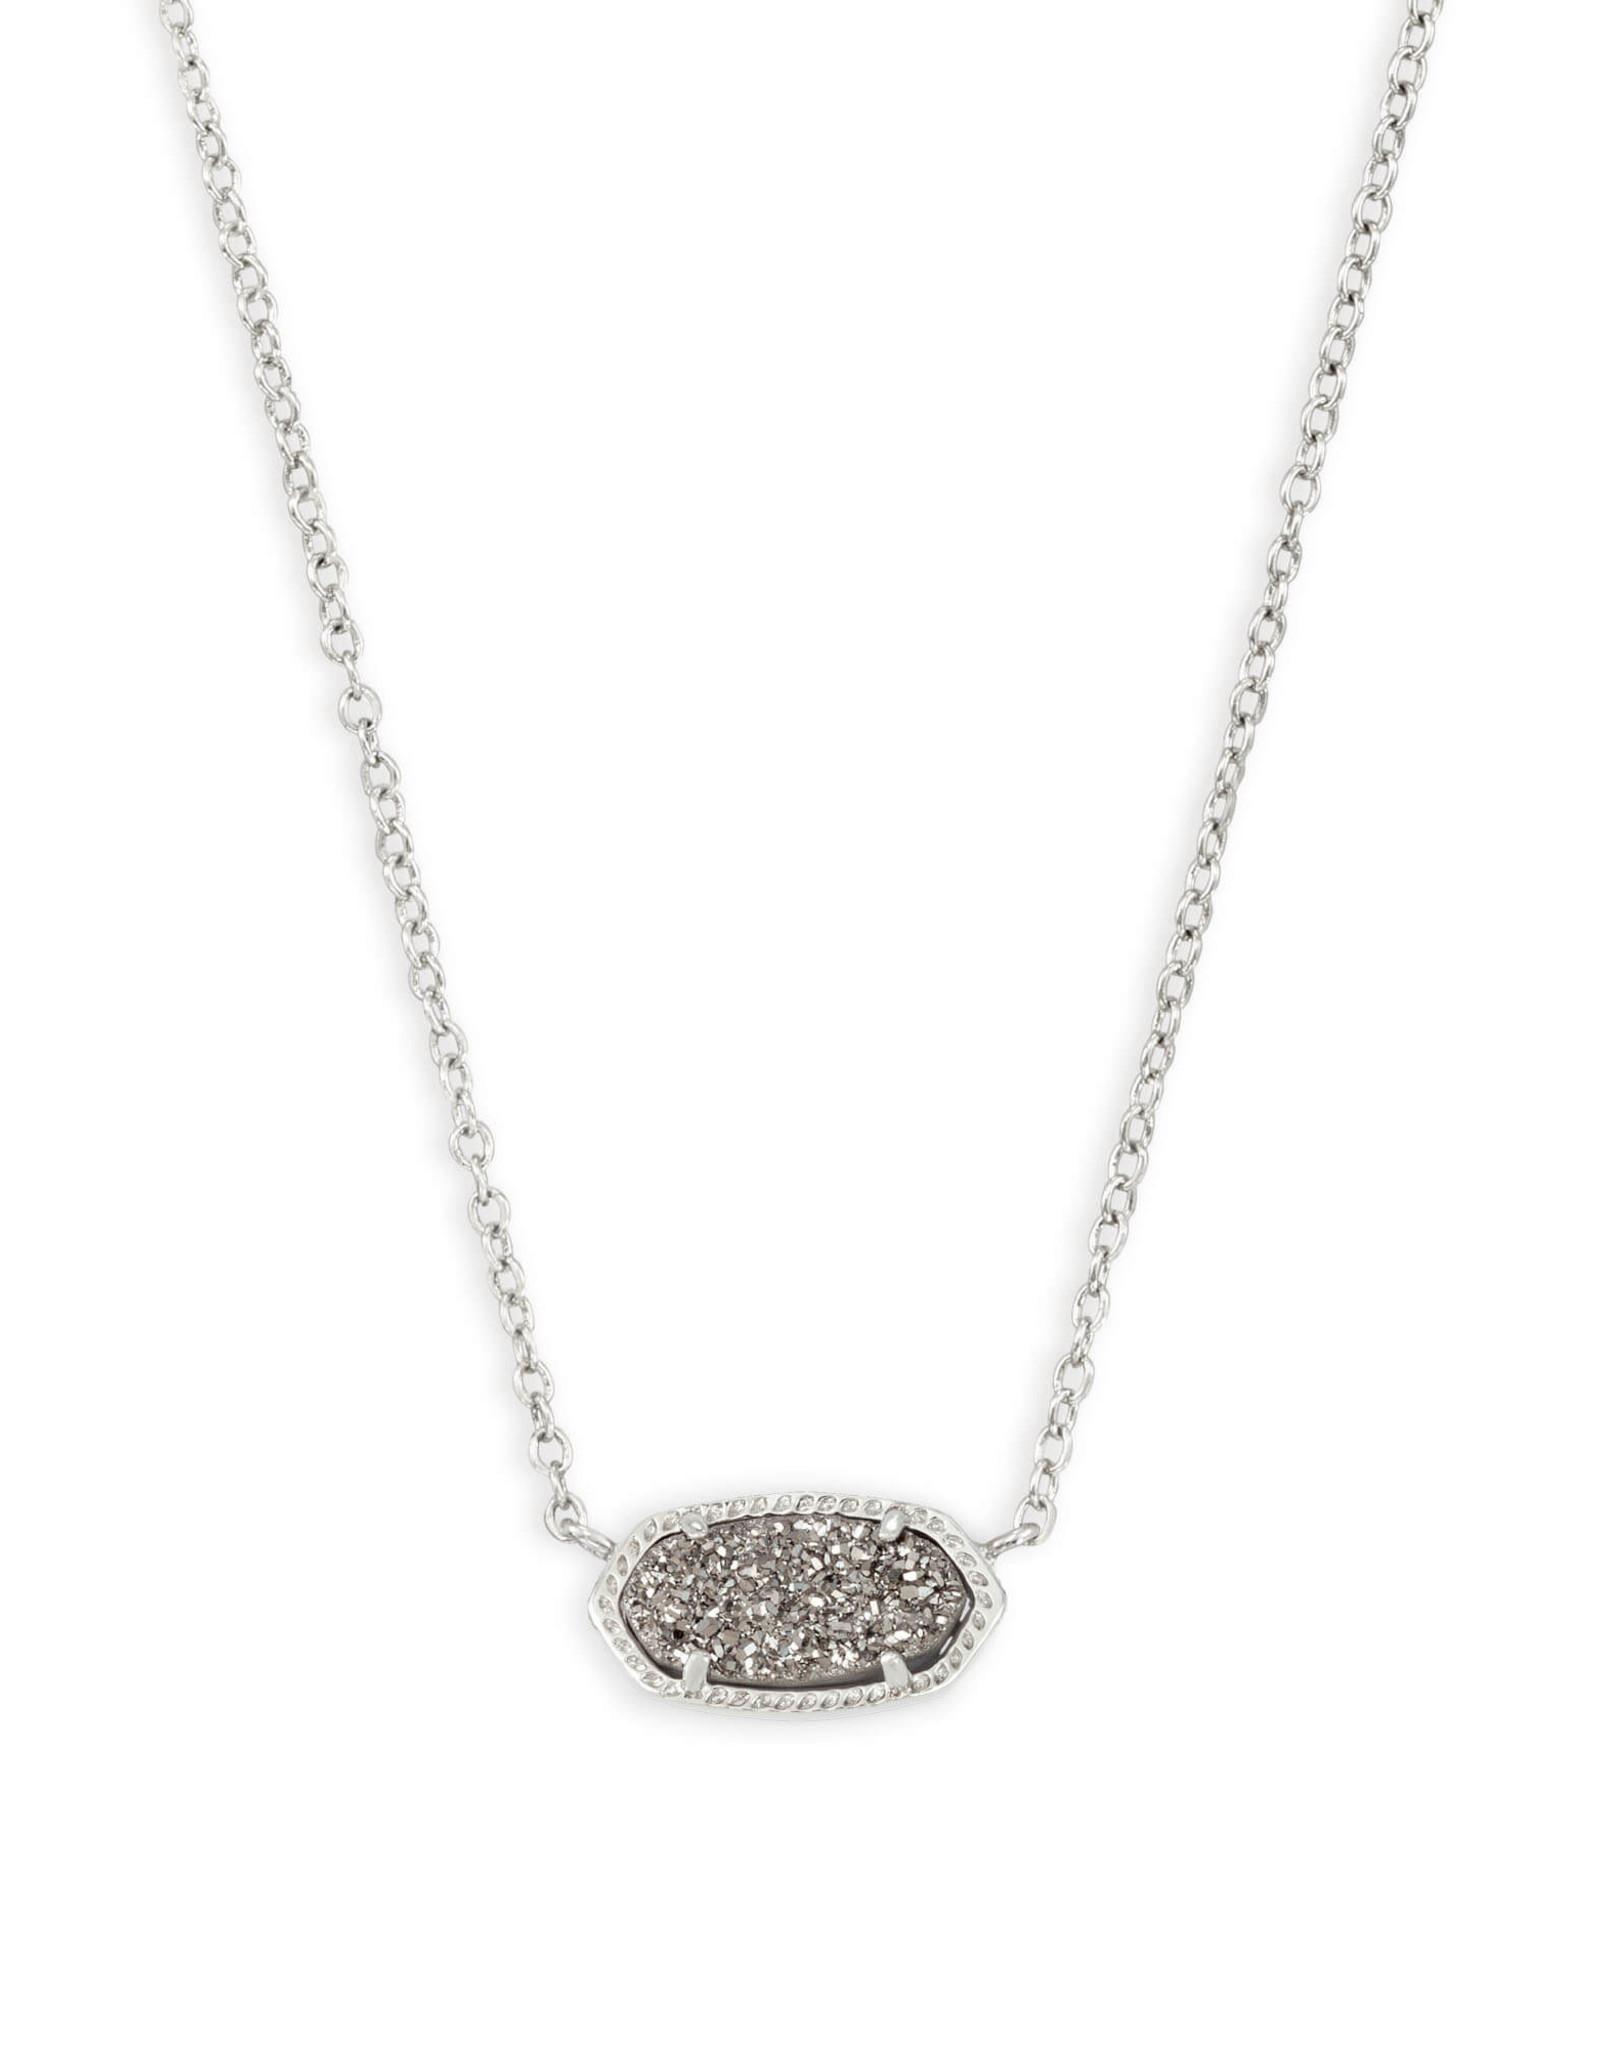 Kendra Scott Elisa Necklace - Platinum Drusy/Rhodium